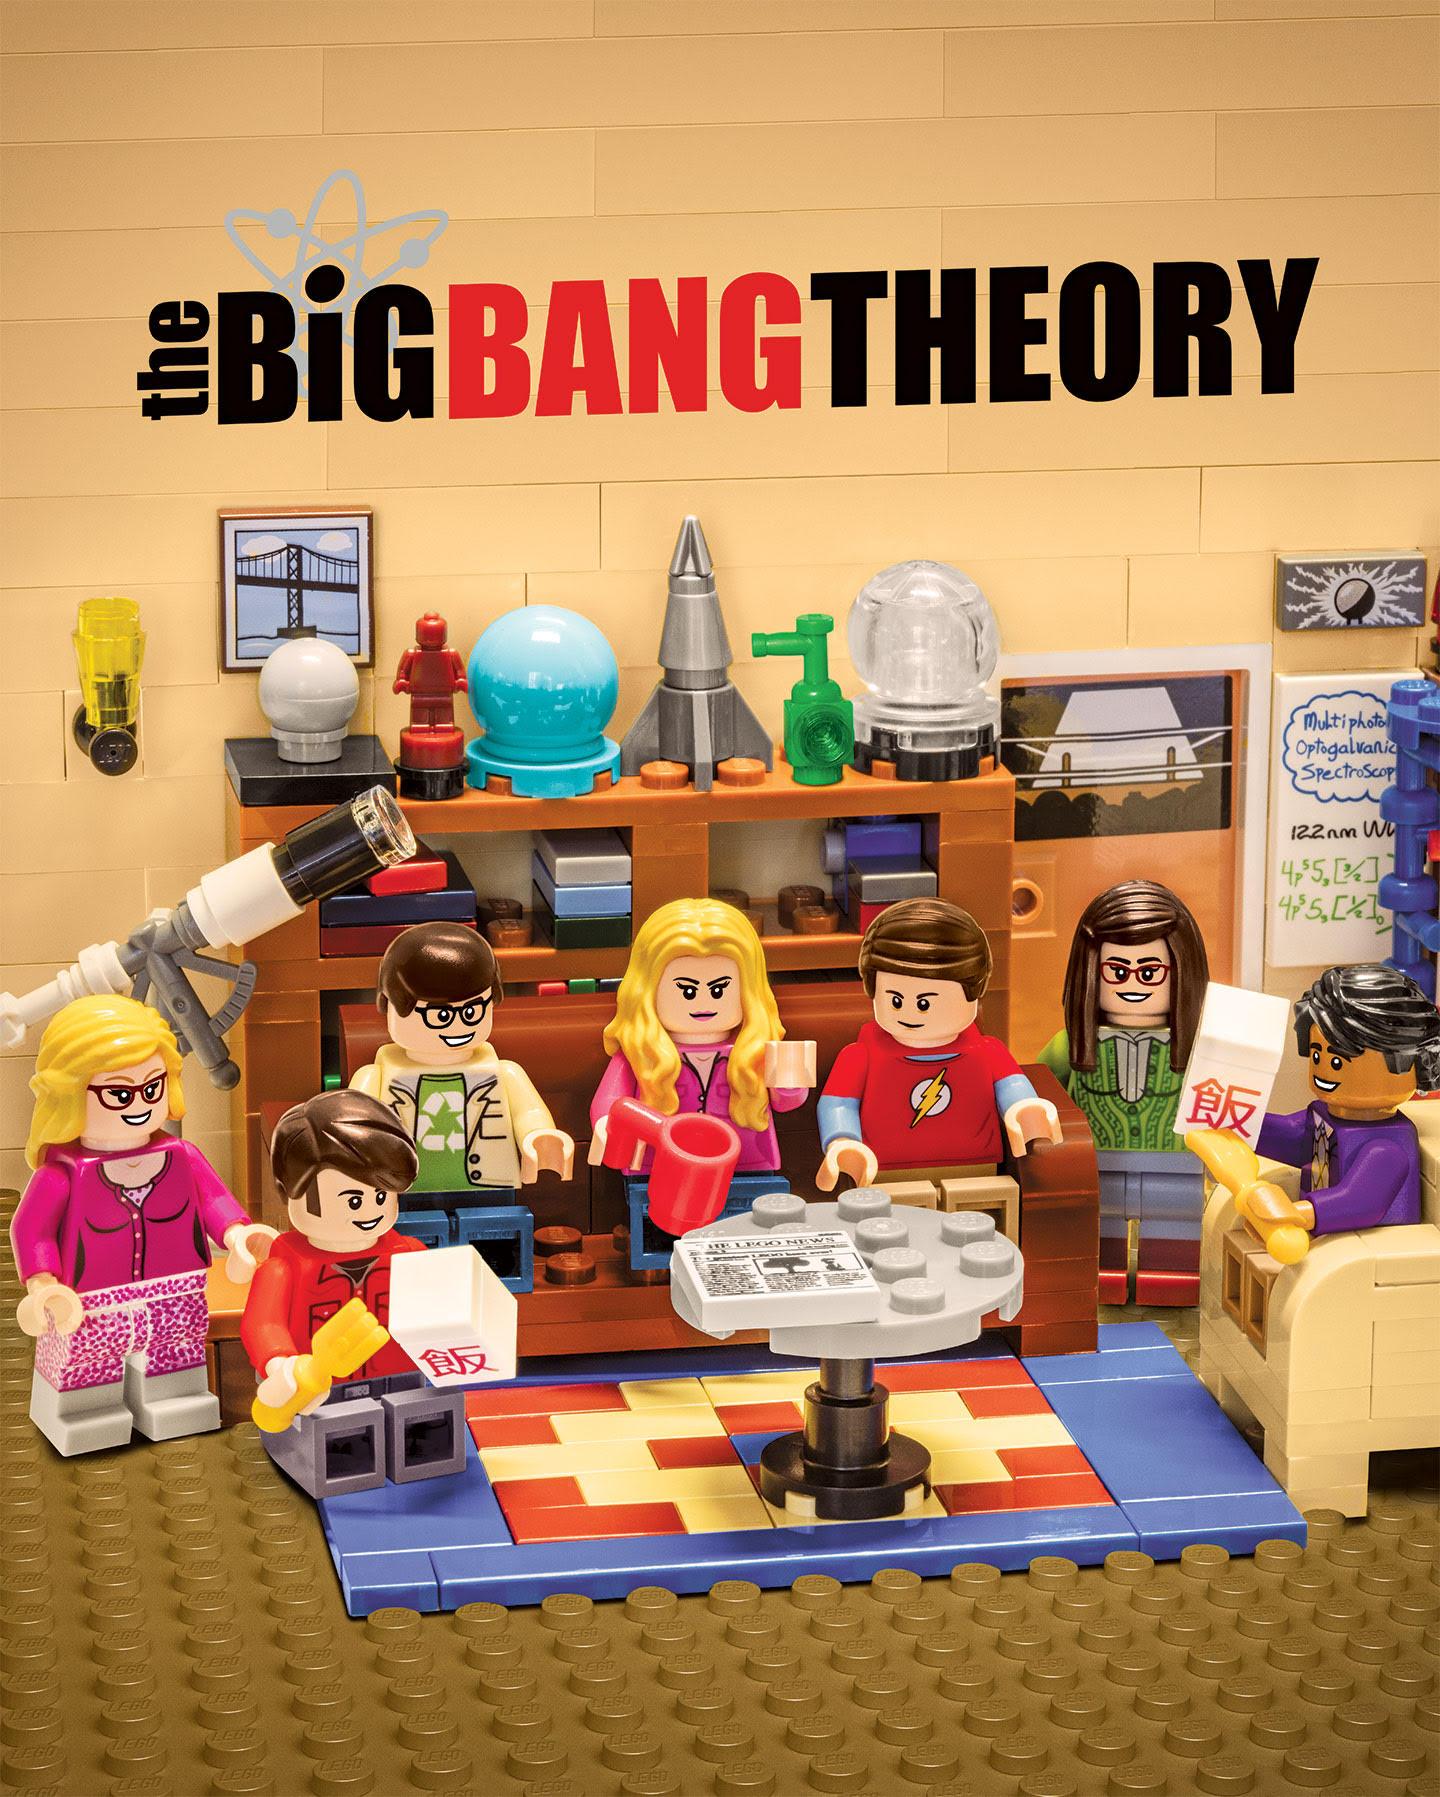 big-bang-theory-the-lego-billboard